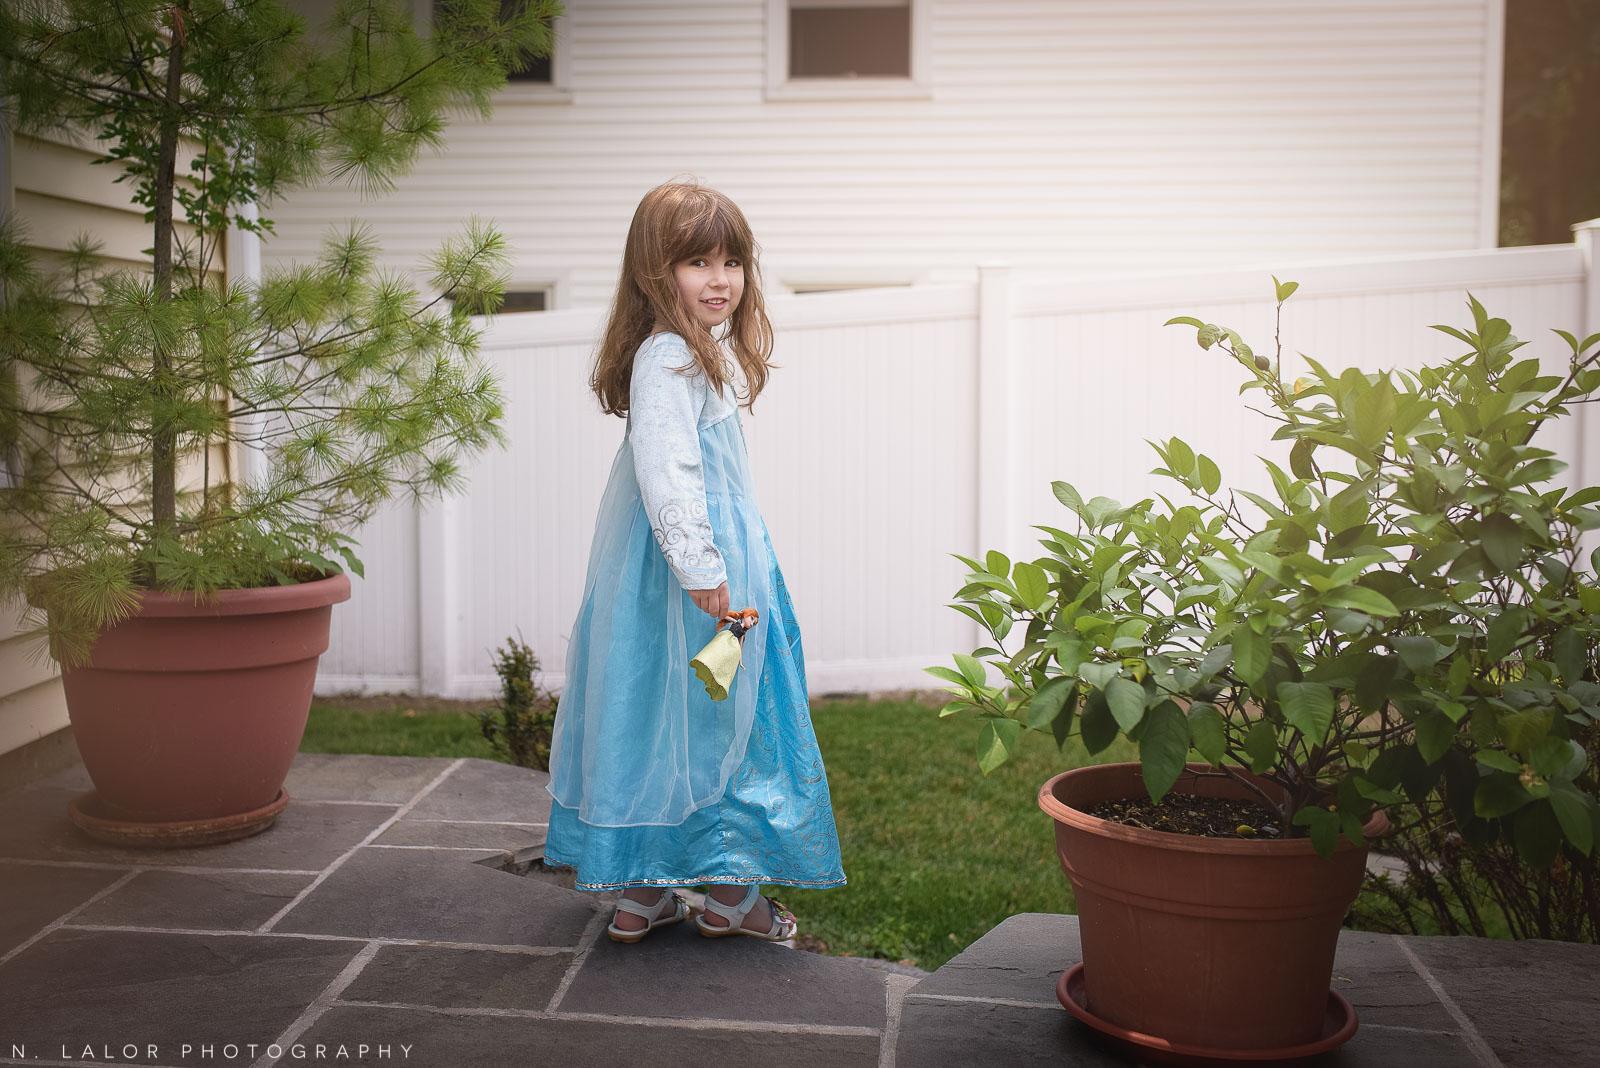 nlalor-photography-2015-daisy-being-elsa-stamford-ct-7.jpg